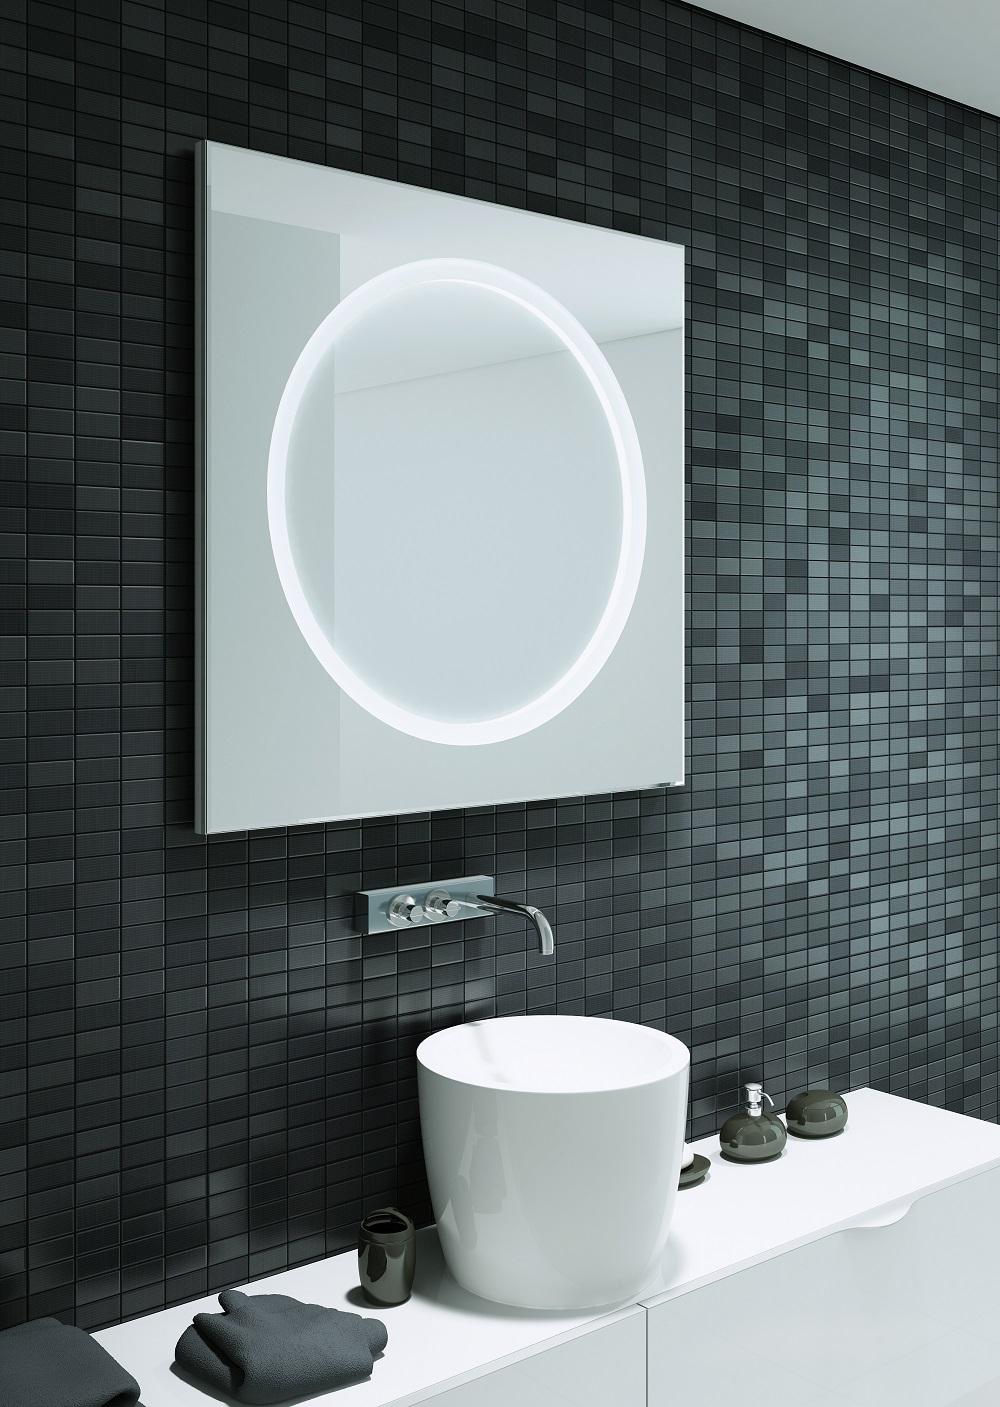 Solar 65 Illuminated LED Bathroom Mirror B004655-0